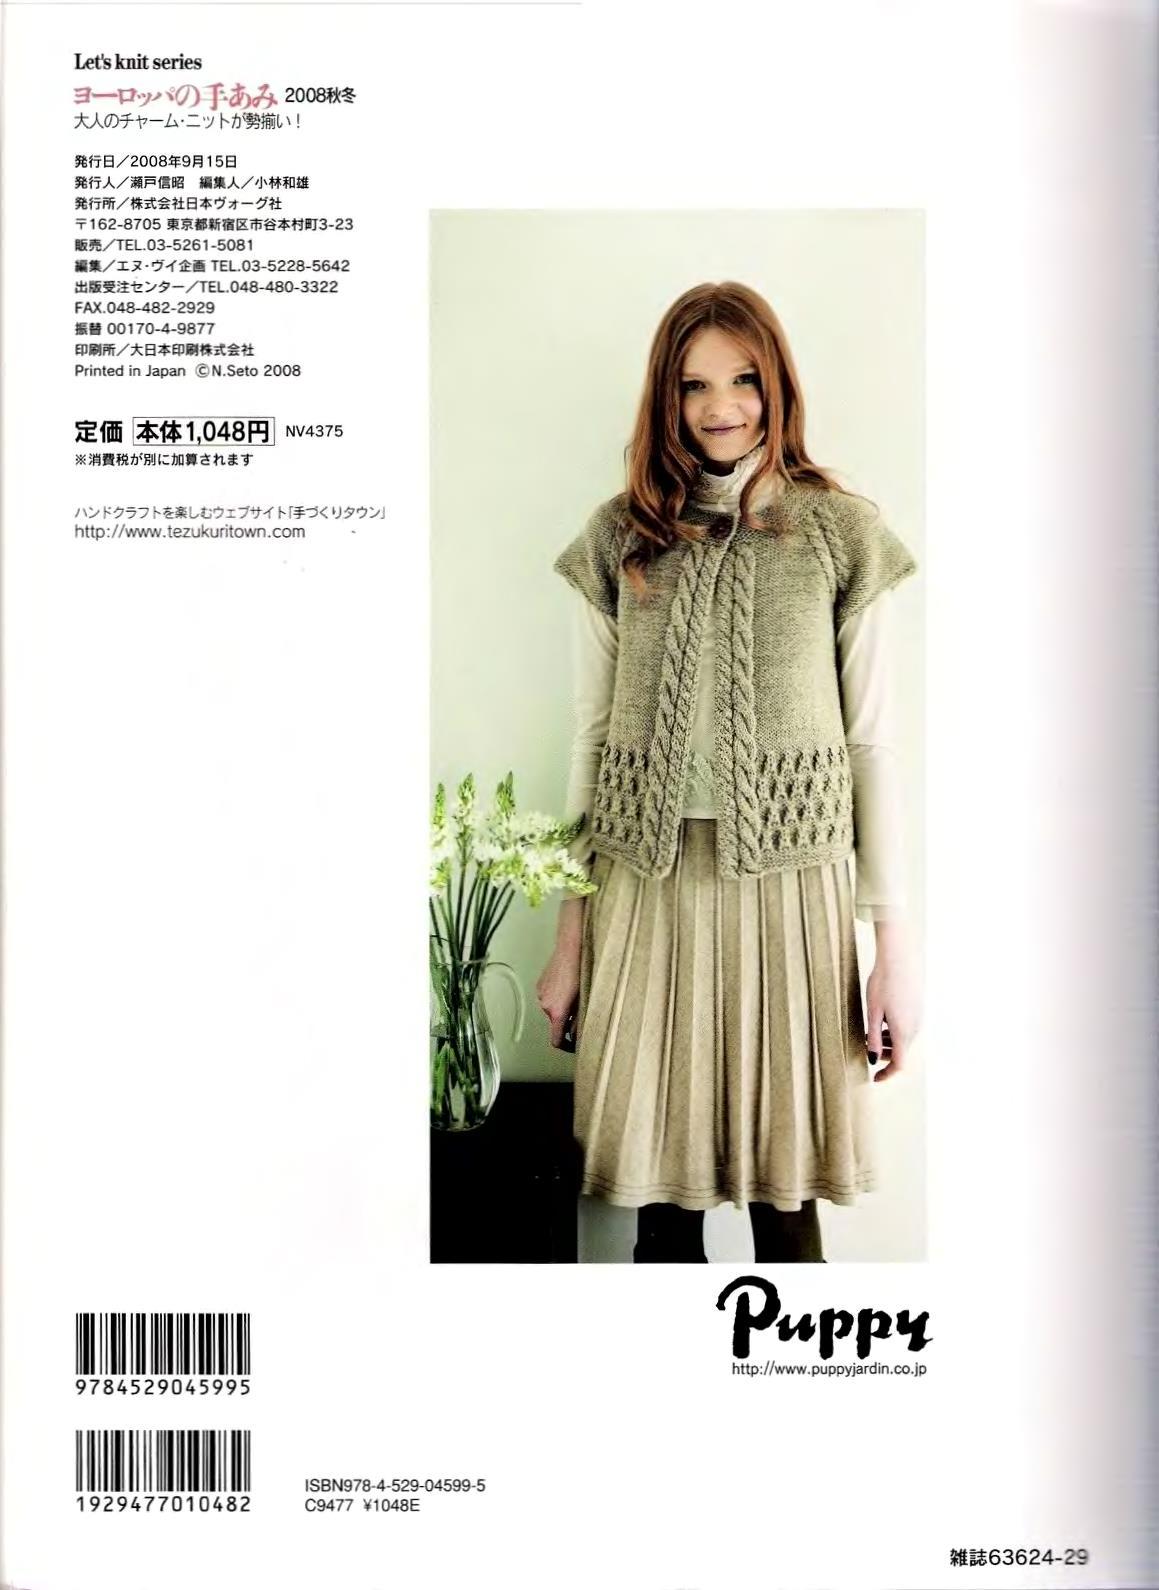 Let's knit series NV4375 2008 M-L sp-kr_80